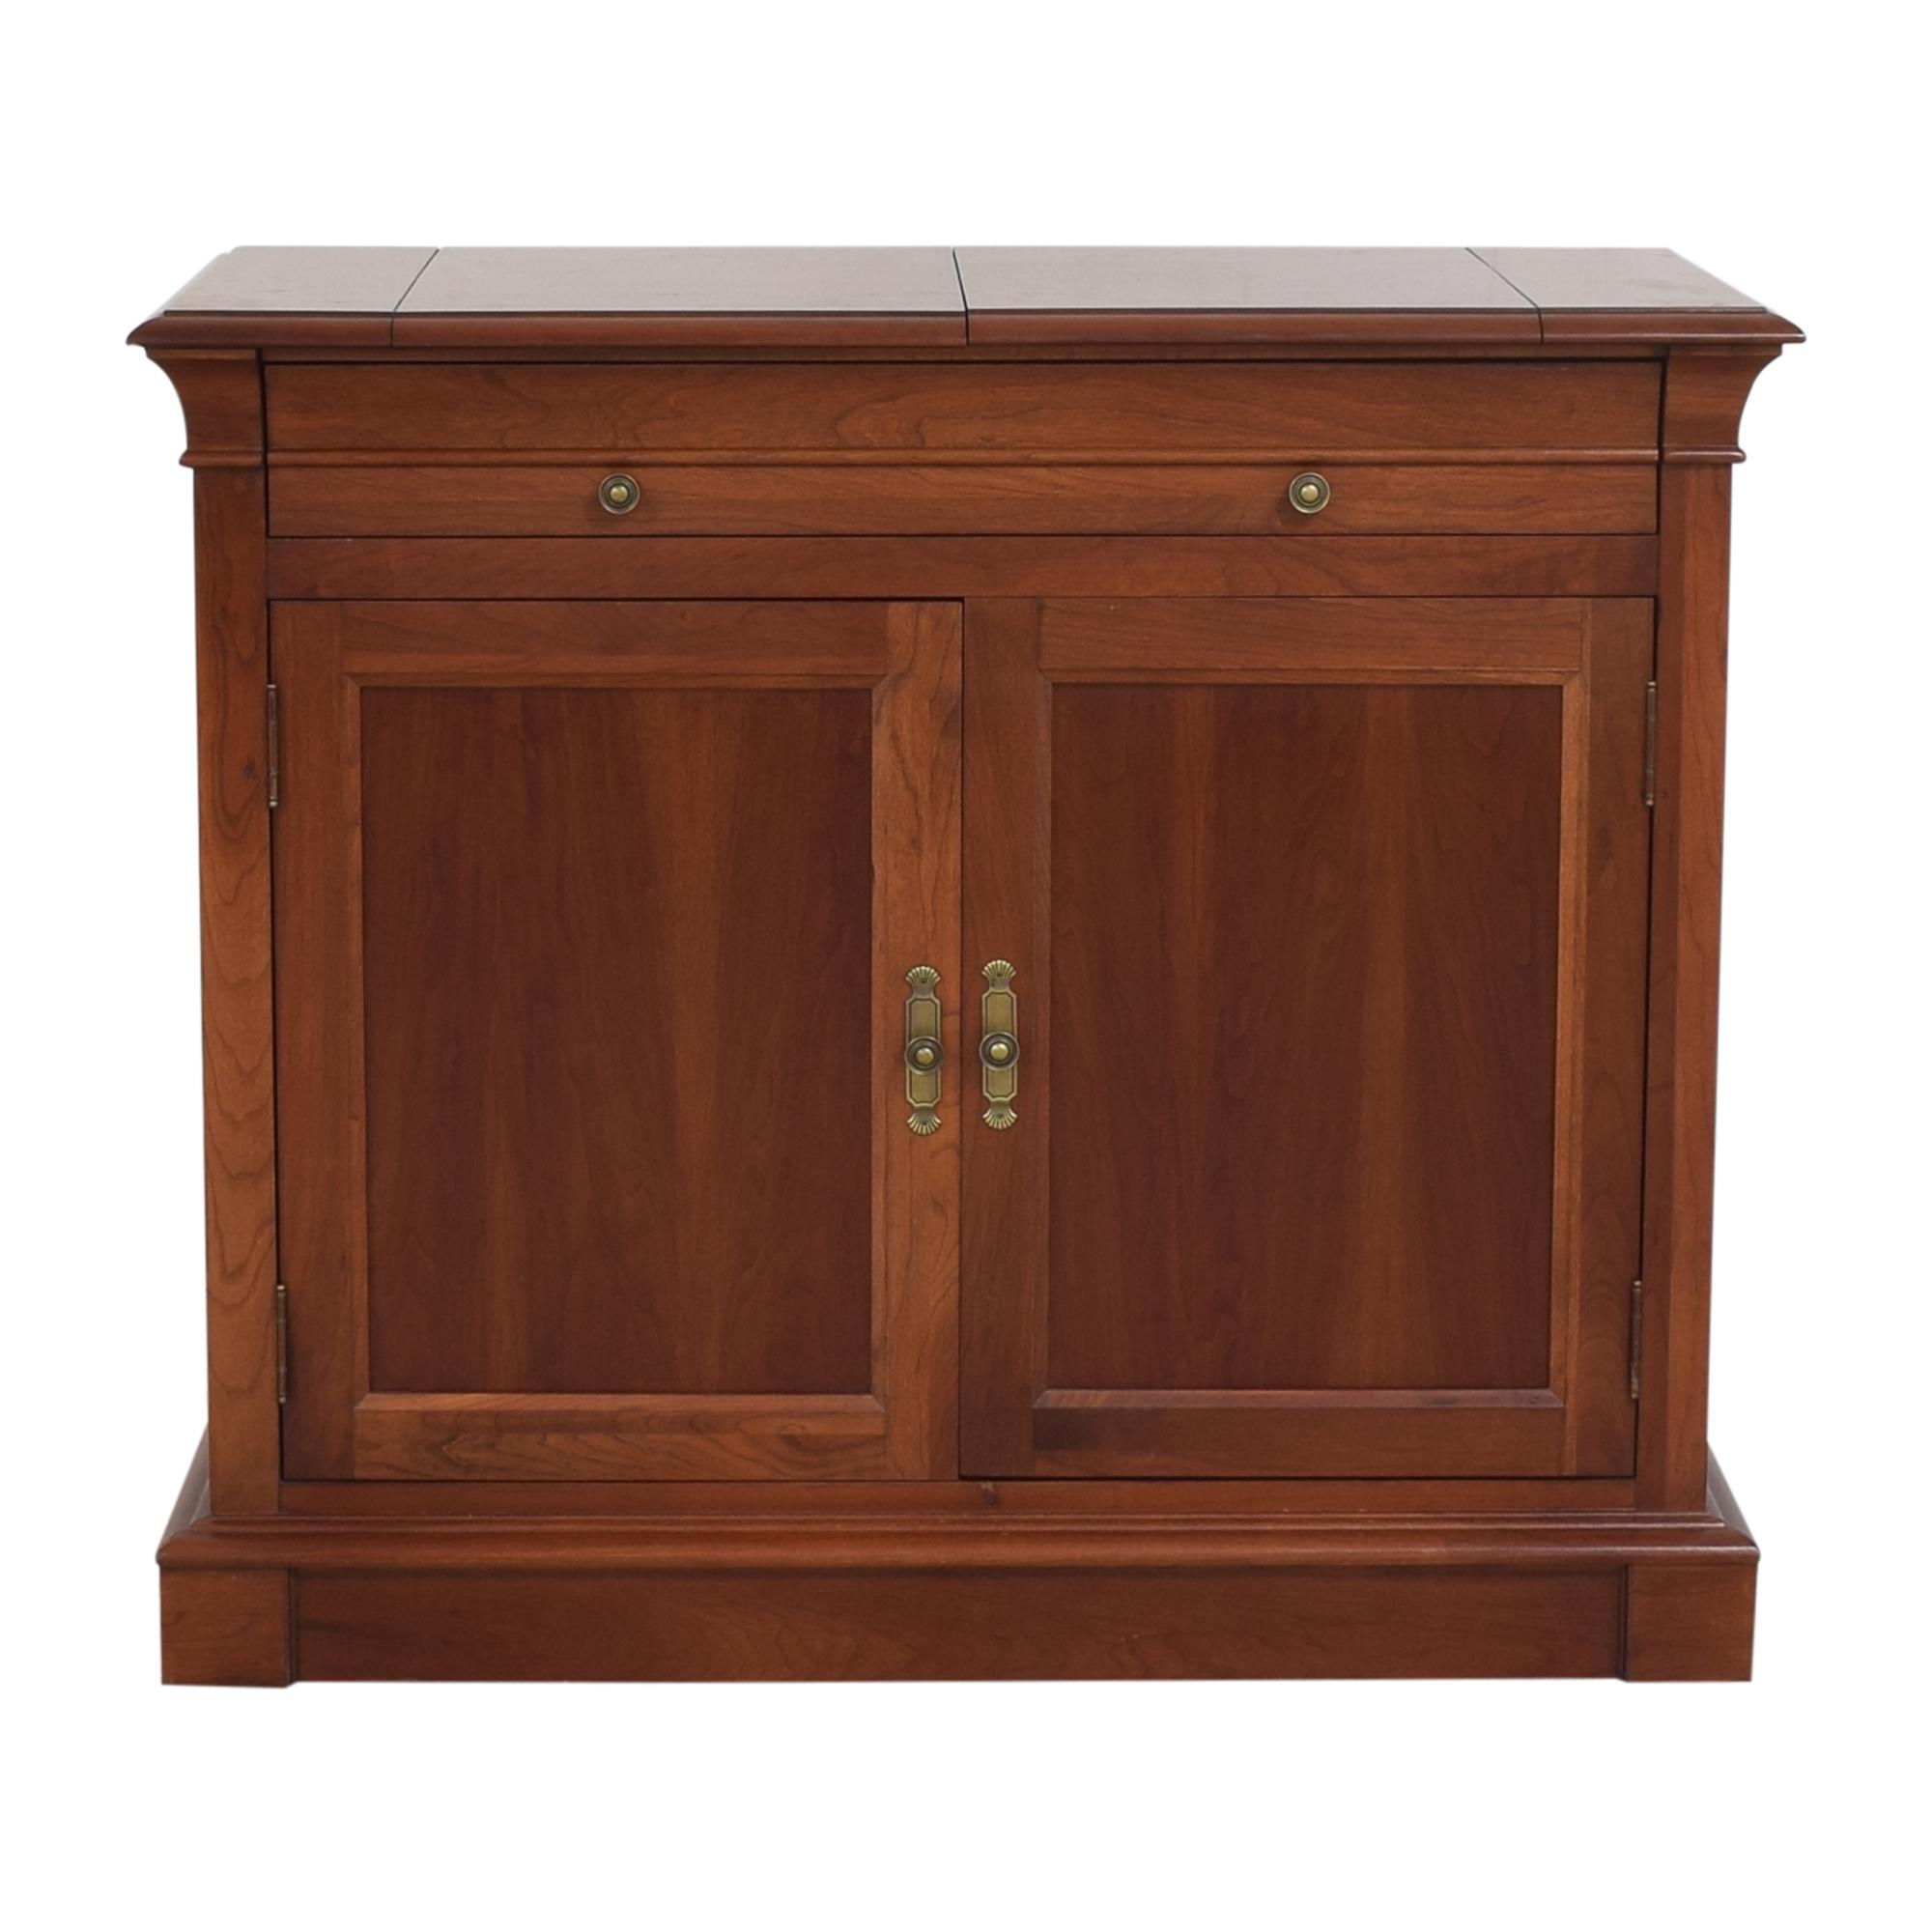 buy Ethan Allen Medallion Flip Top Buffet Cabinet Ethan Allen Storage